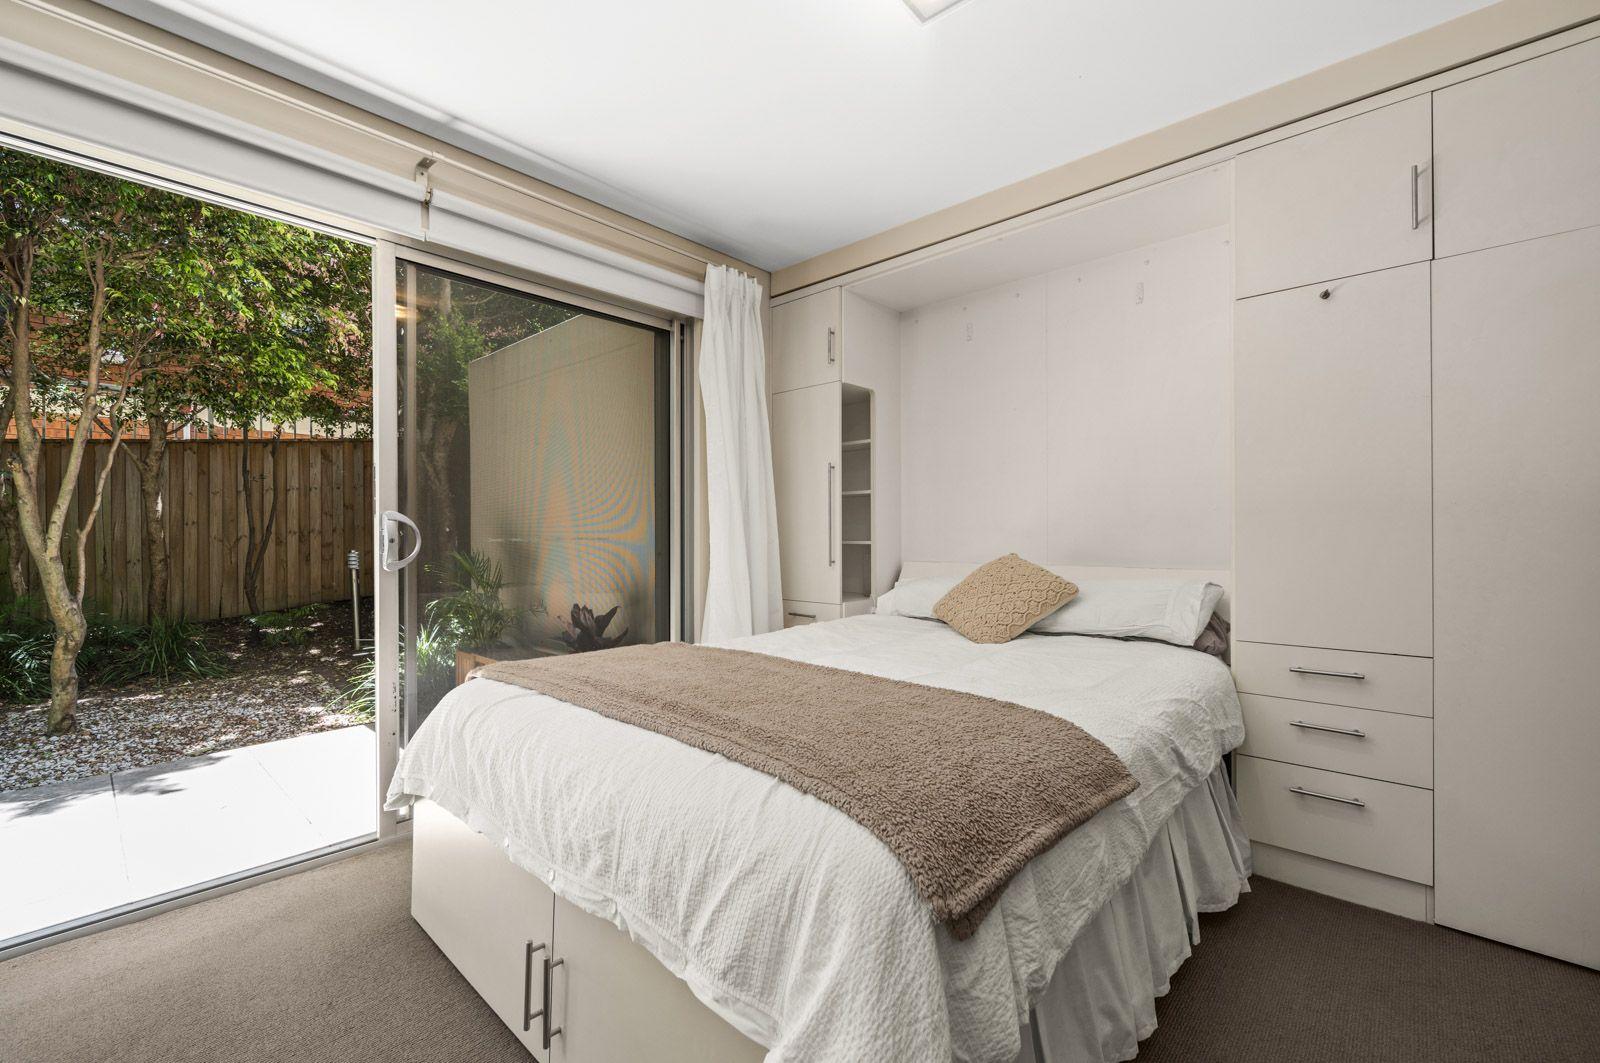 4/39 Roslaind Street, Cammeray NSW 2062, Image 2